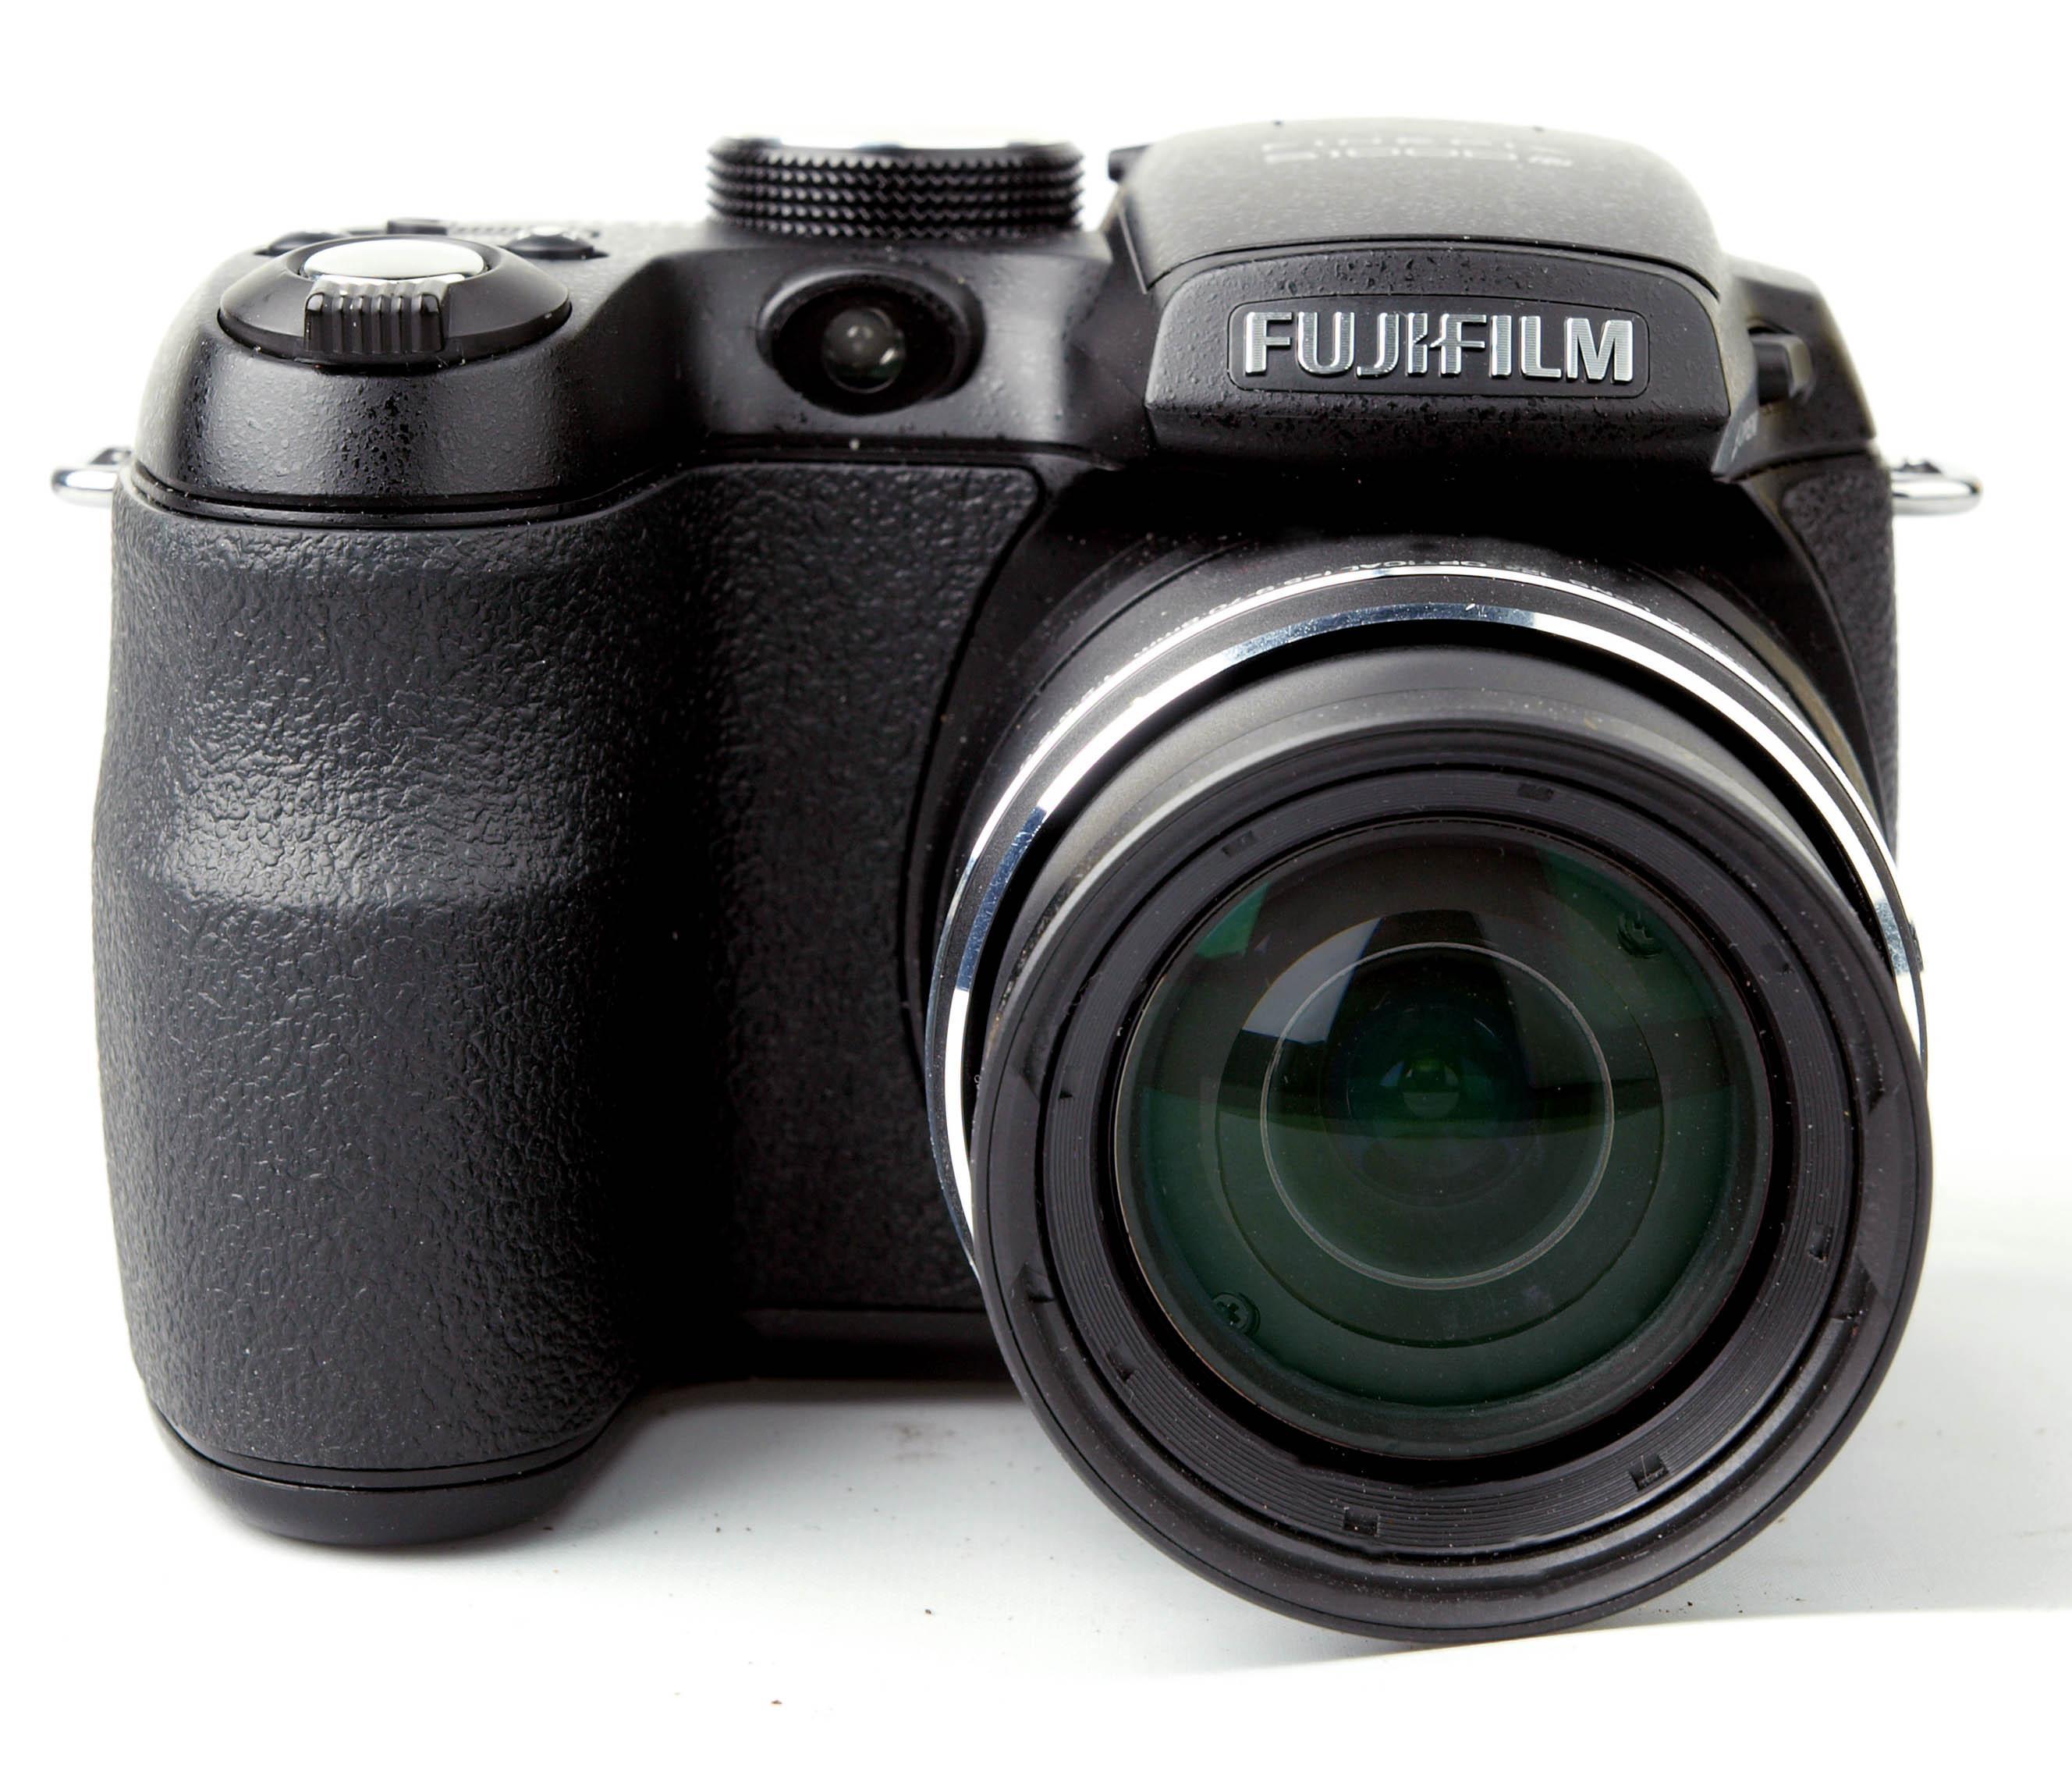 Fuji Digital Cameras: Fujifilm FinePix S1000fd Digital Camera Review